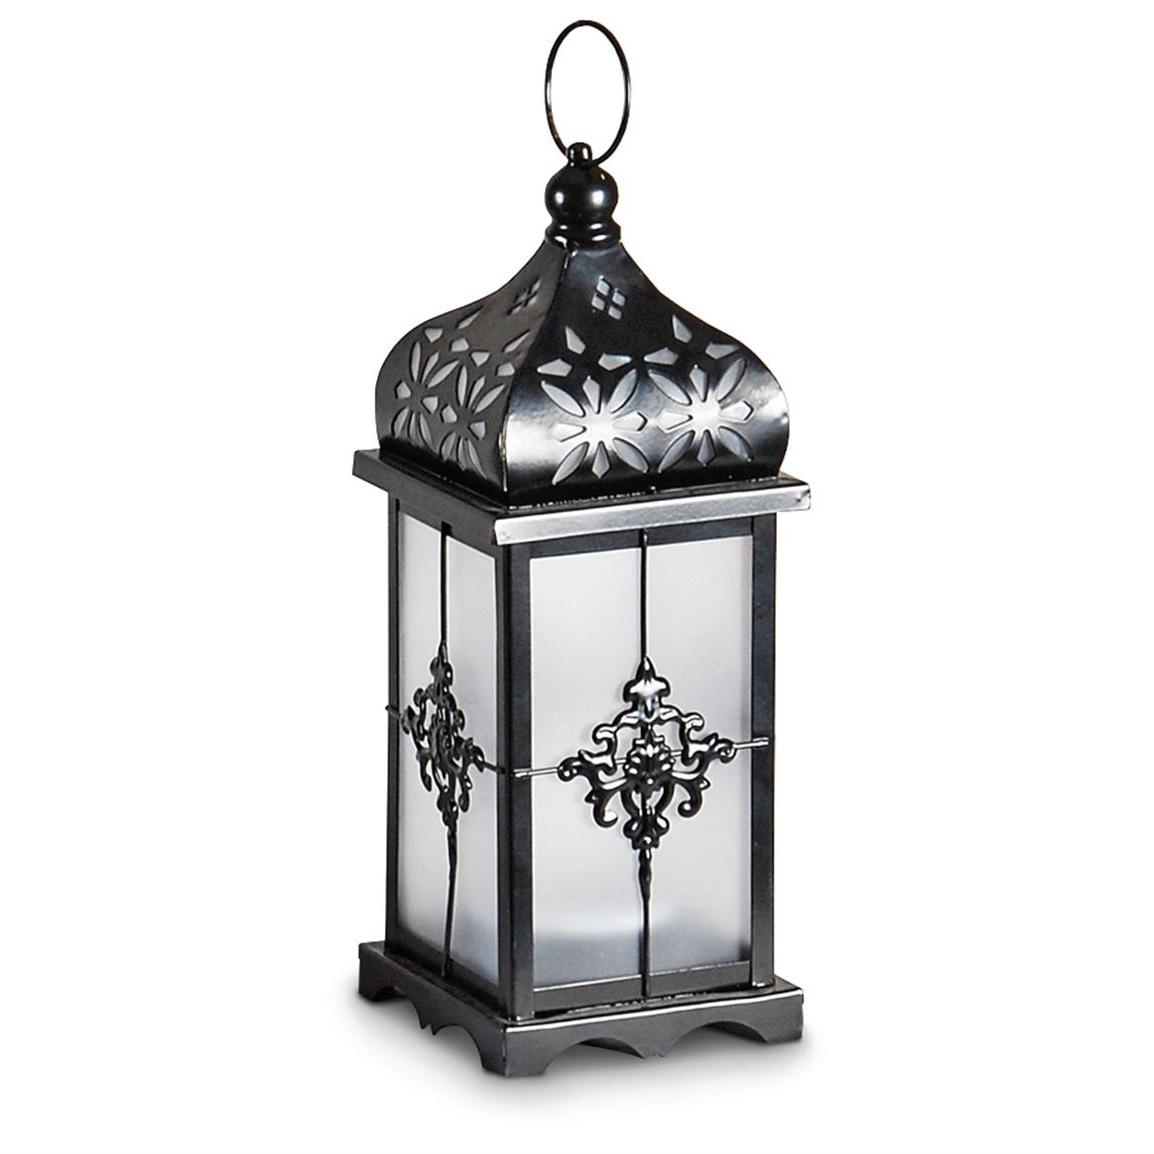 2 Filigree Solar Lanterns – 232102, Solar & Outdoor Lighting At In Most Popular Outdoor Decorative Lanterns (View 1 of 20)